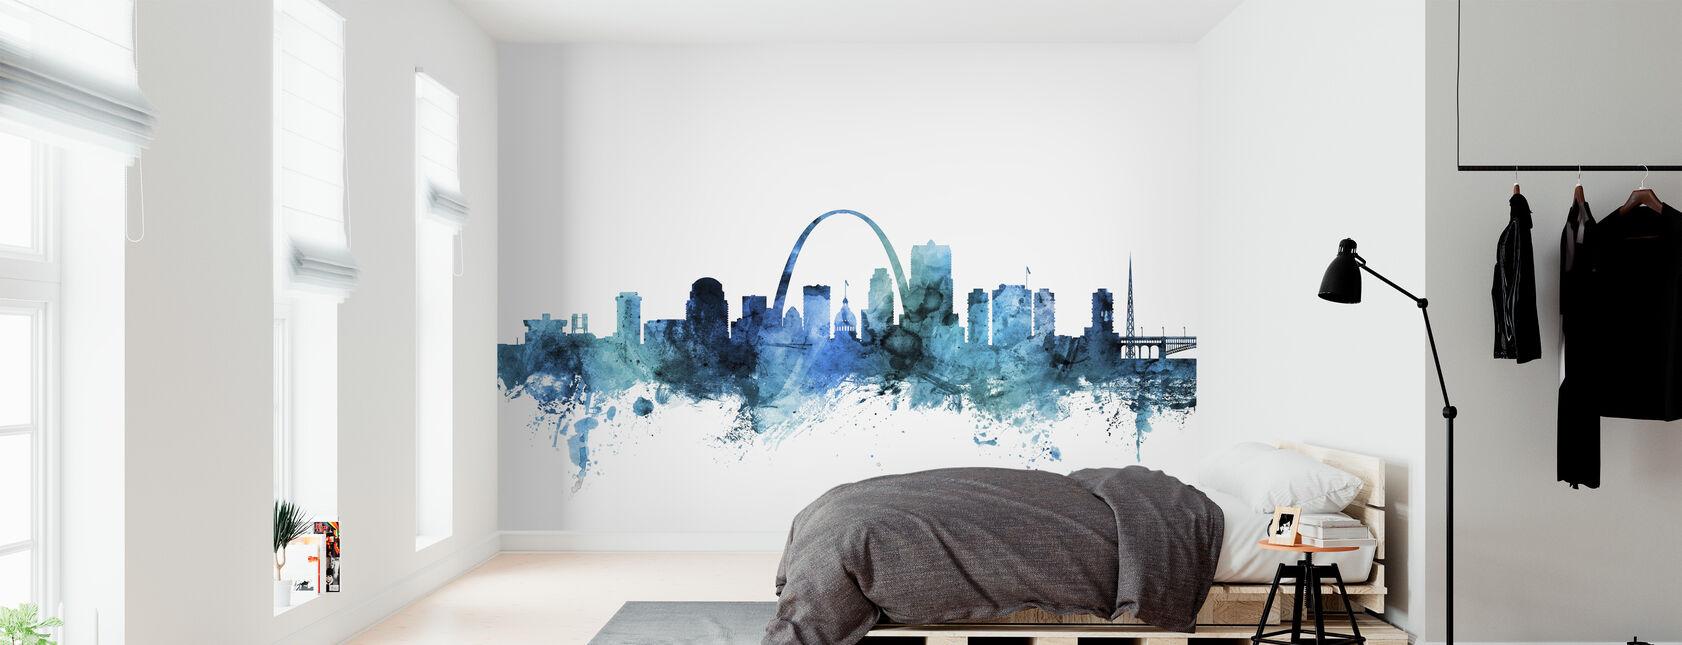 St Louis Missouri Skyline - Wallpaper - Bedroom